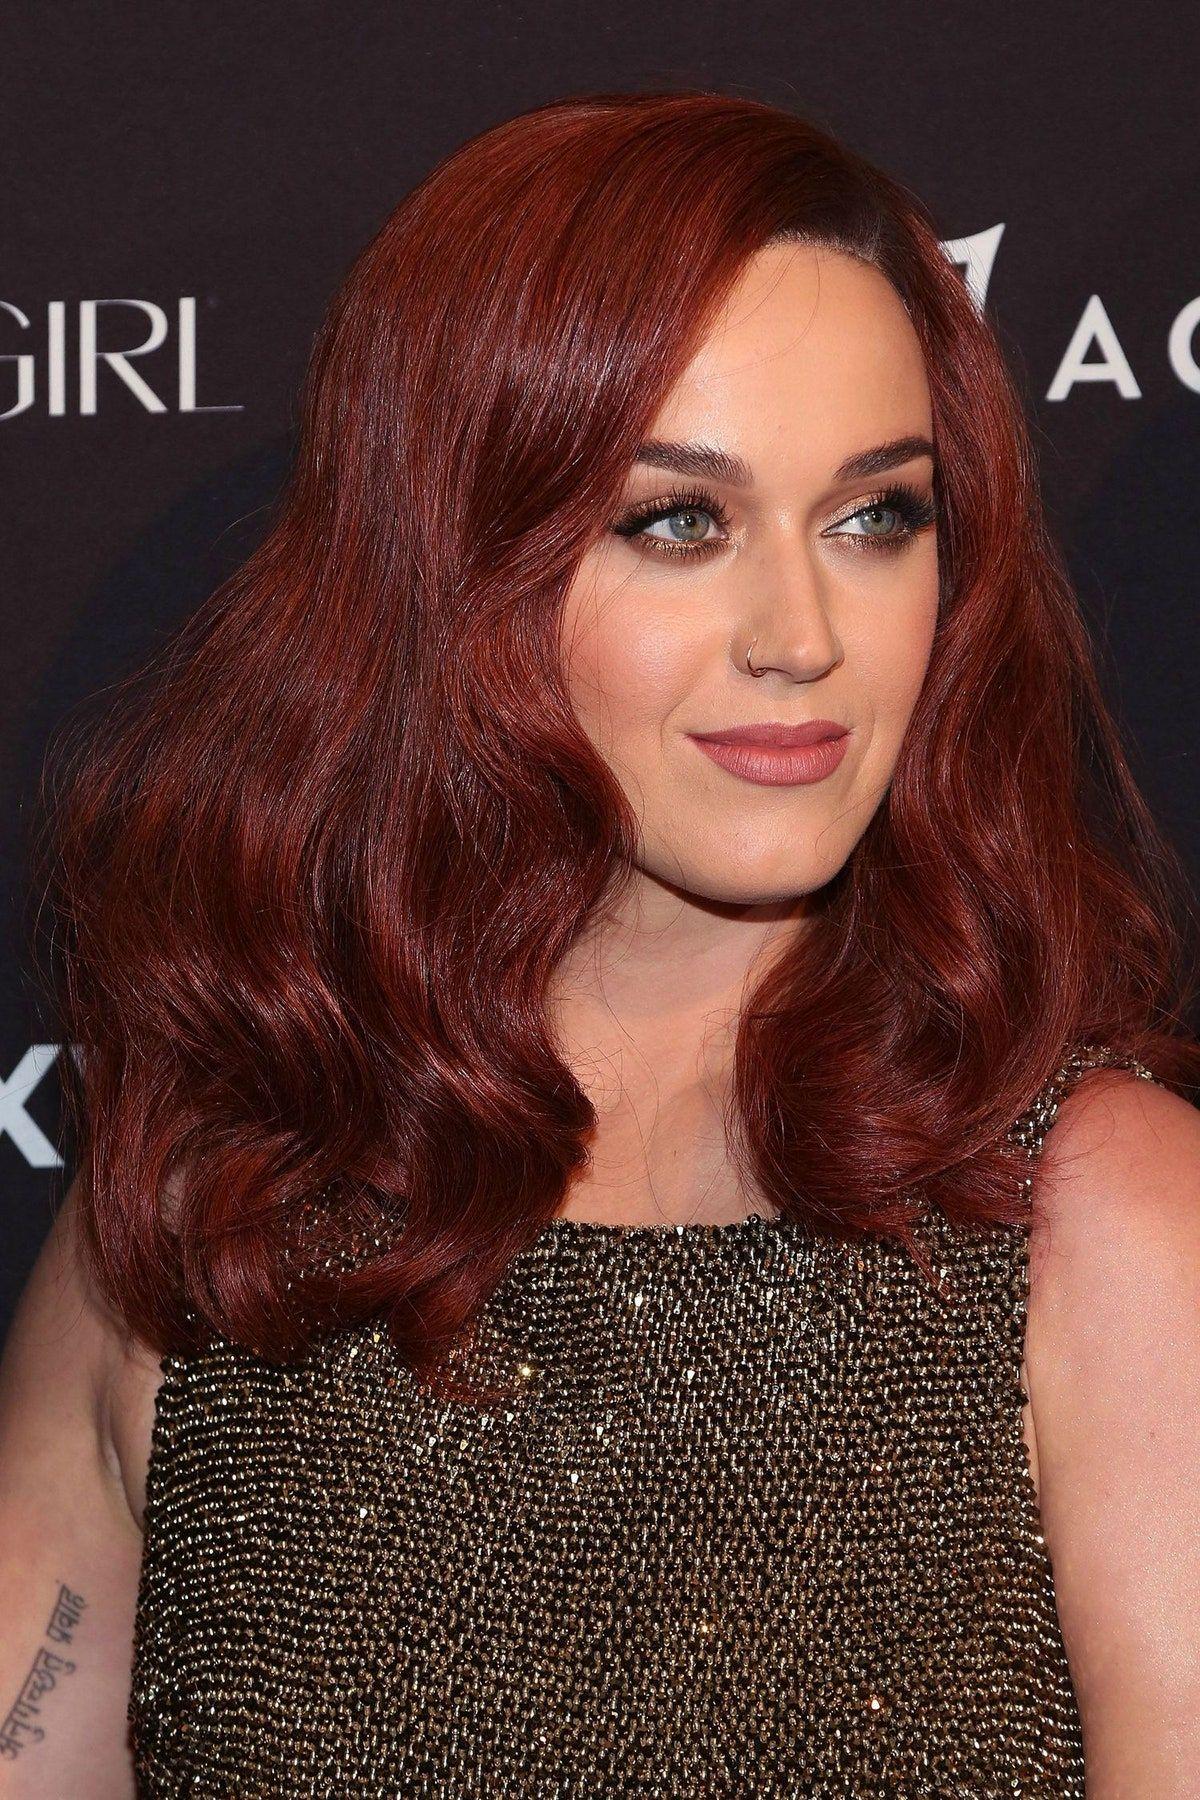 Katy Perry S New Auburn Hair Celebrity Beauty News Glamour In 2020 Hair Color Auburn Dark Red Hair Color Shades Of Red Hair